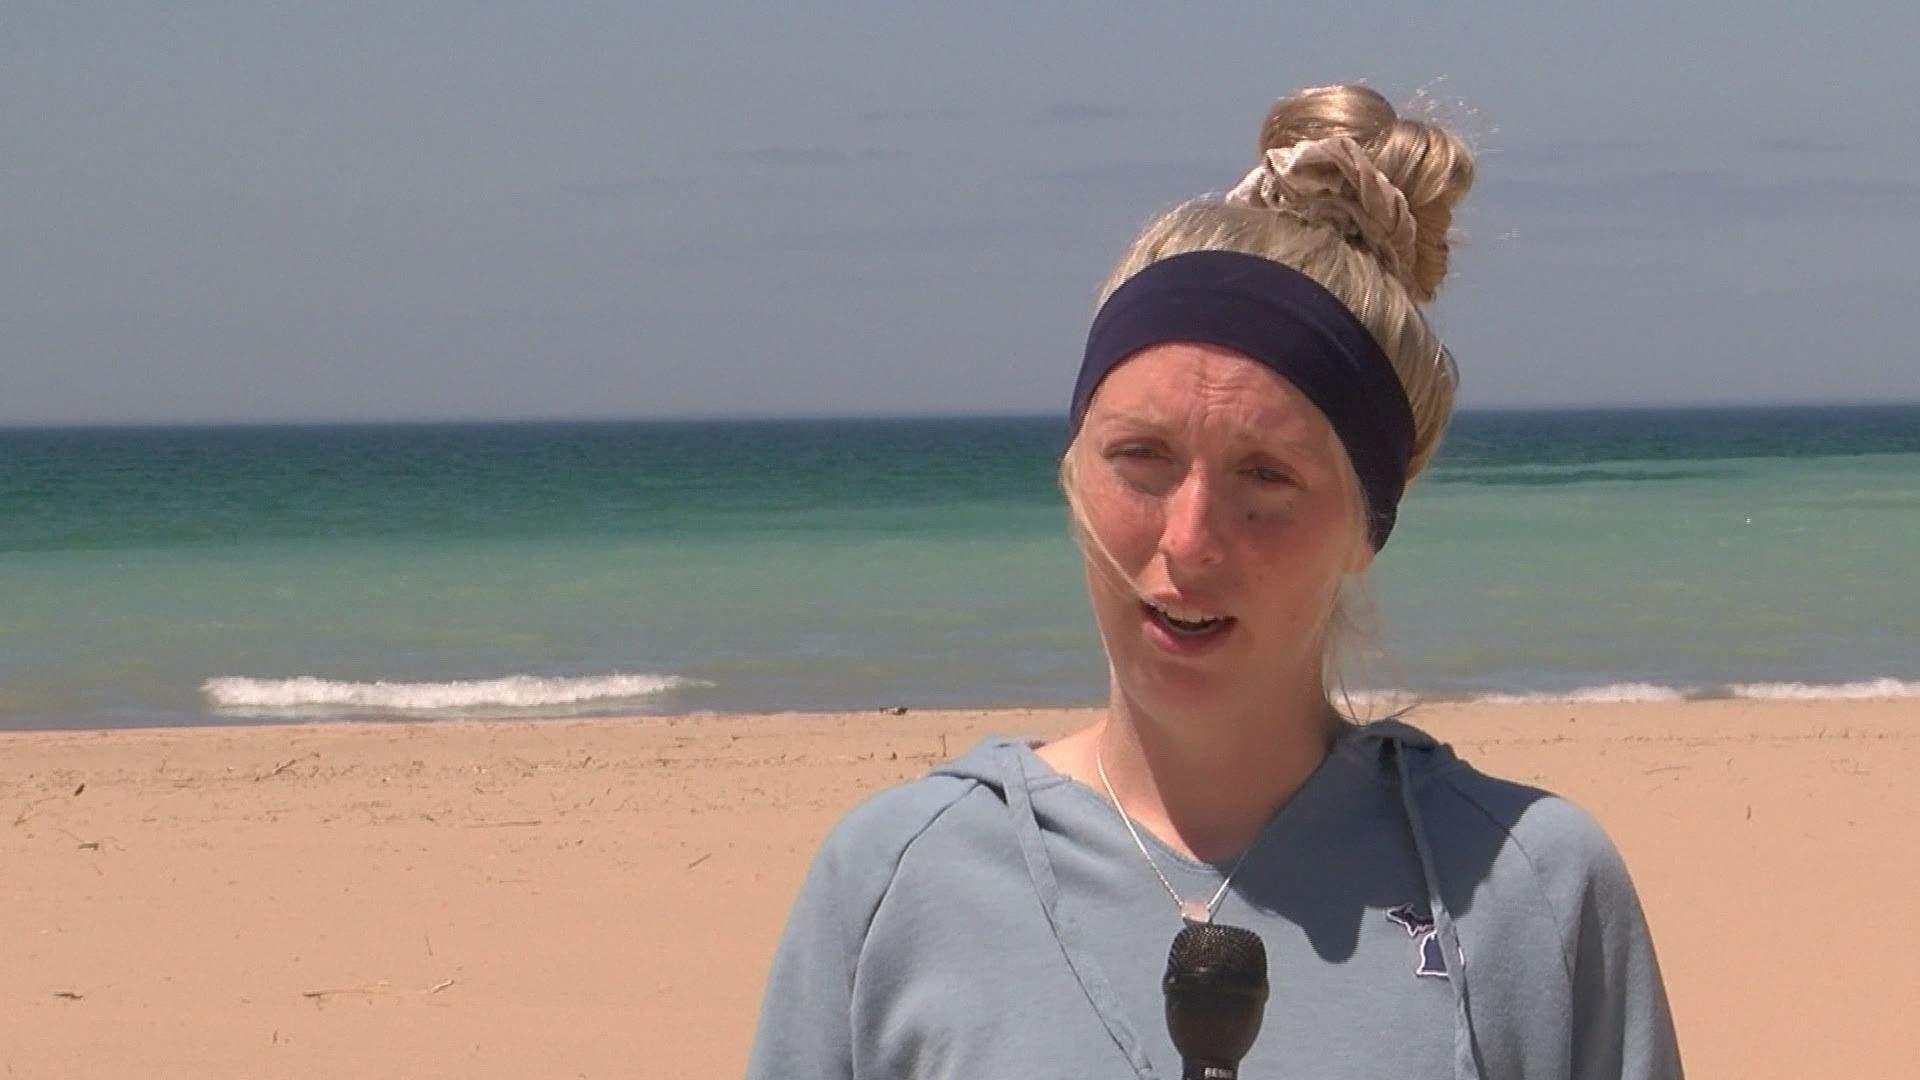 Woman giving an interview at a beach